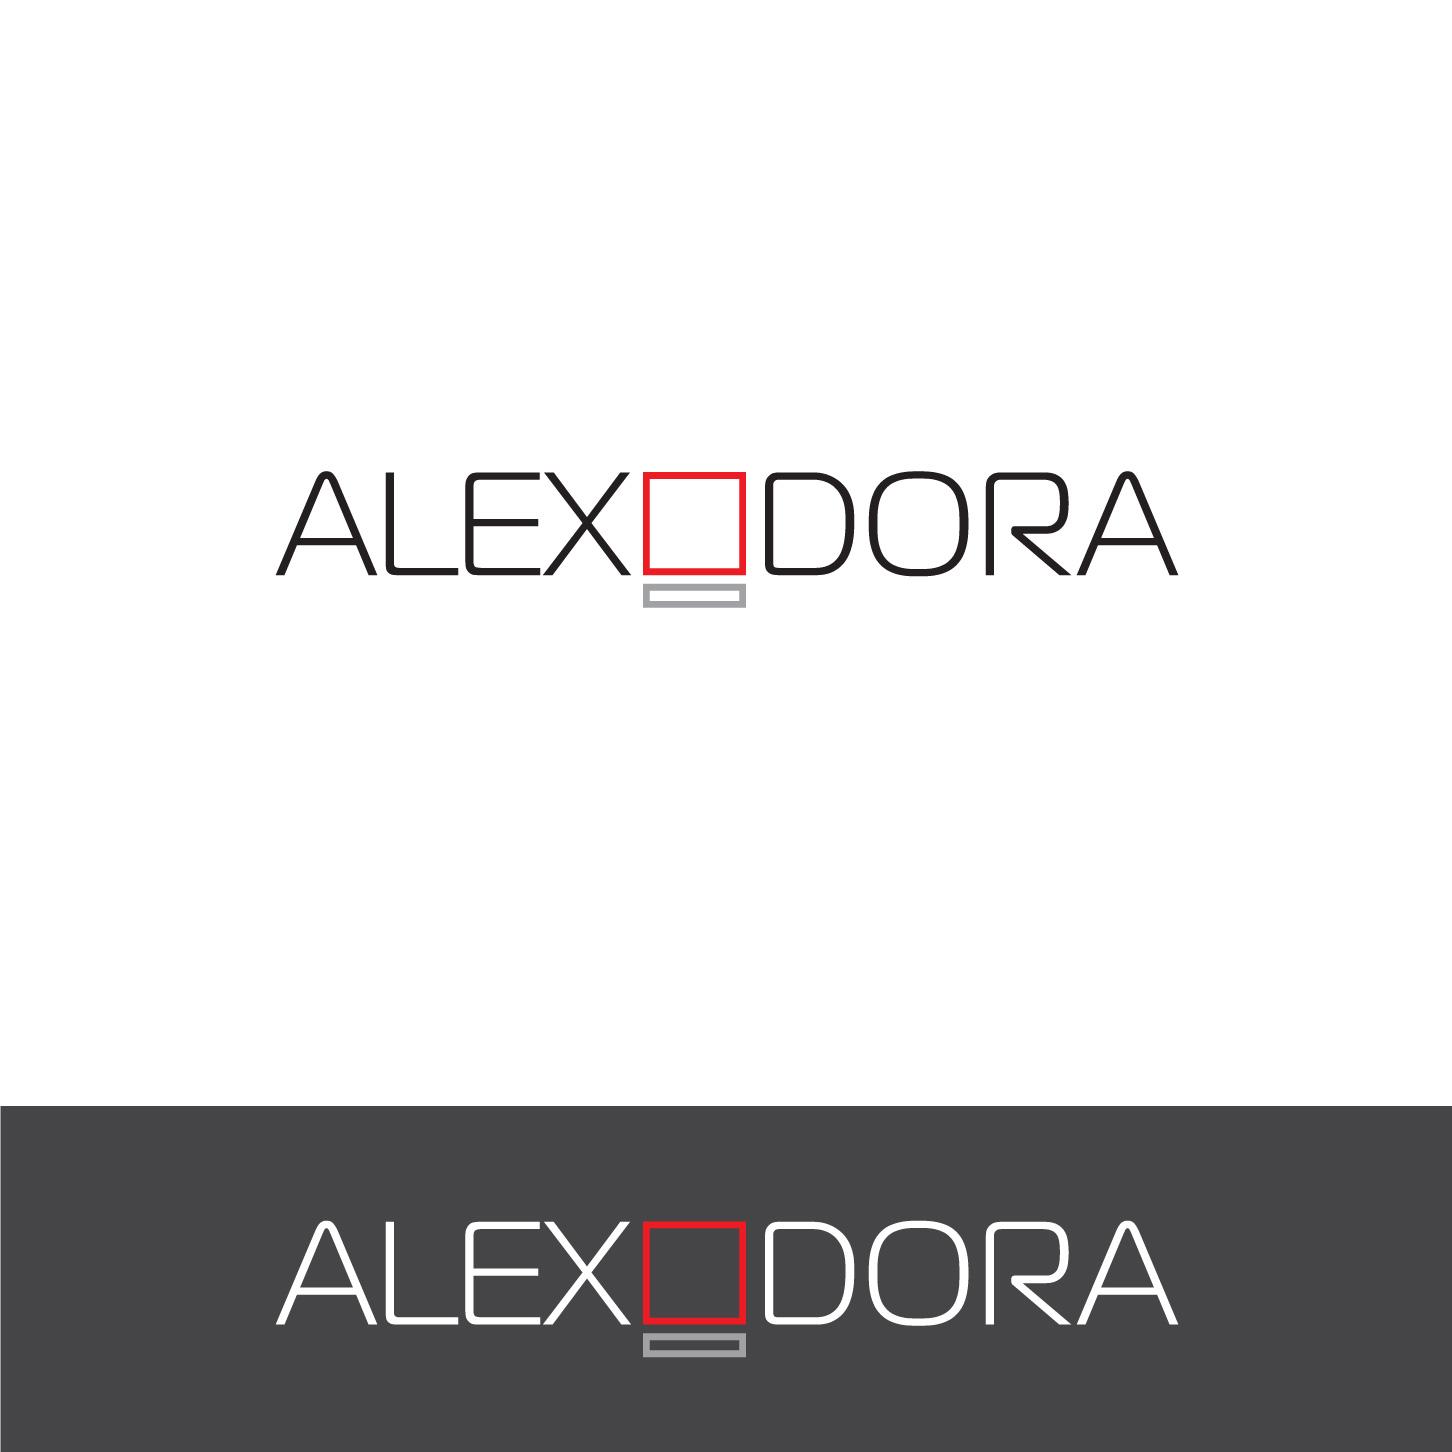 Необходим дизайнер для доработки логотипа бренда одежды фото f_4205b39071099938.jpg